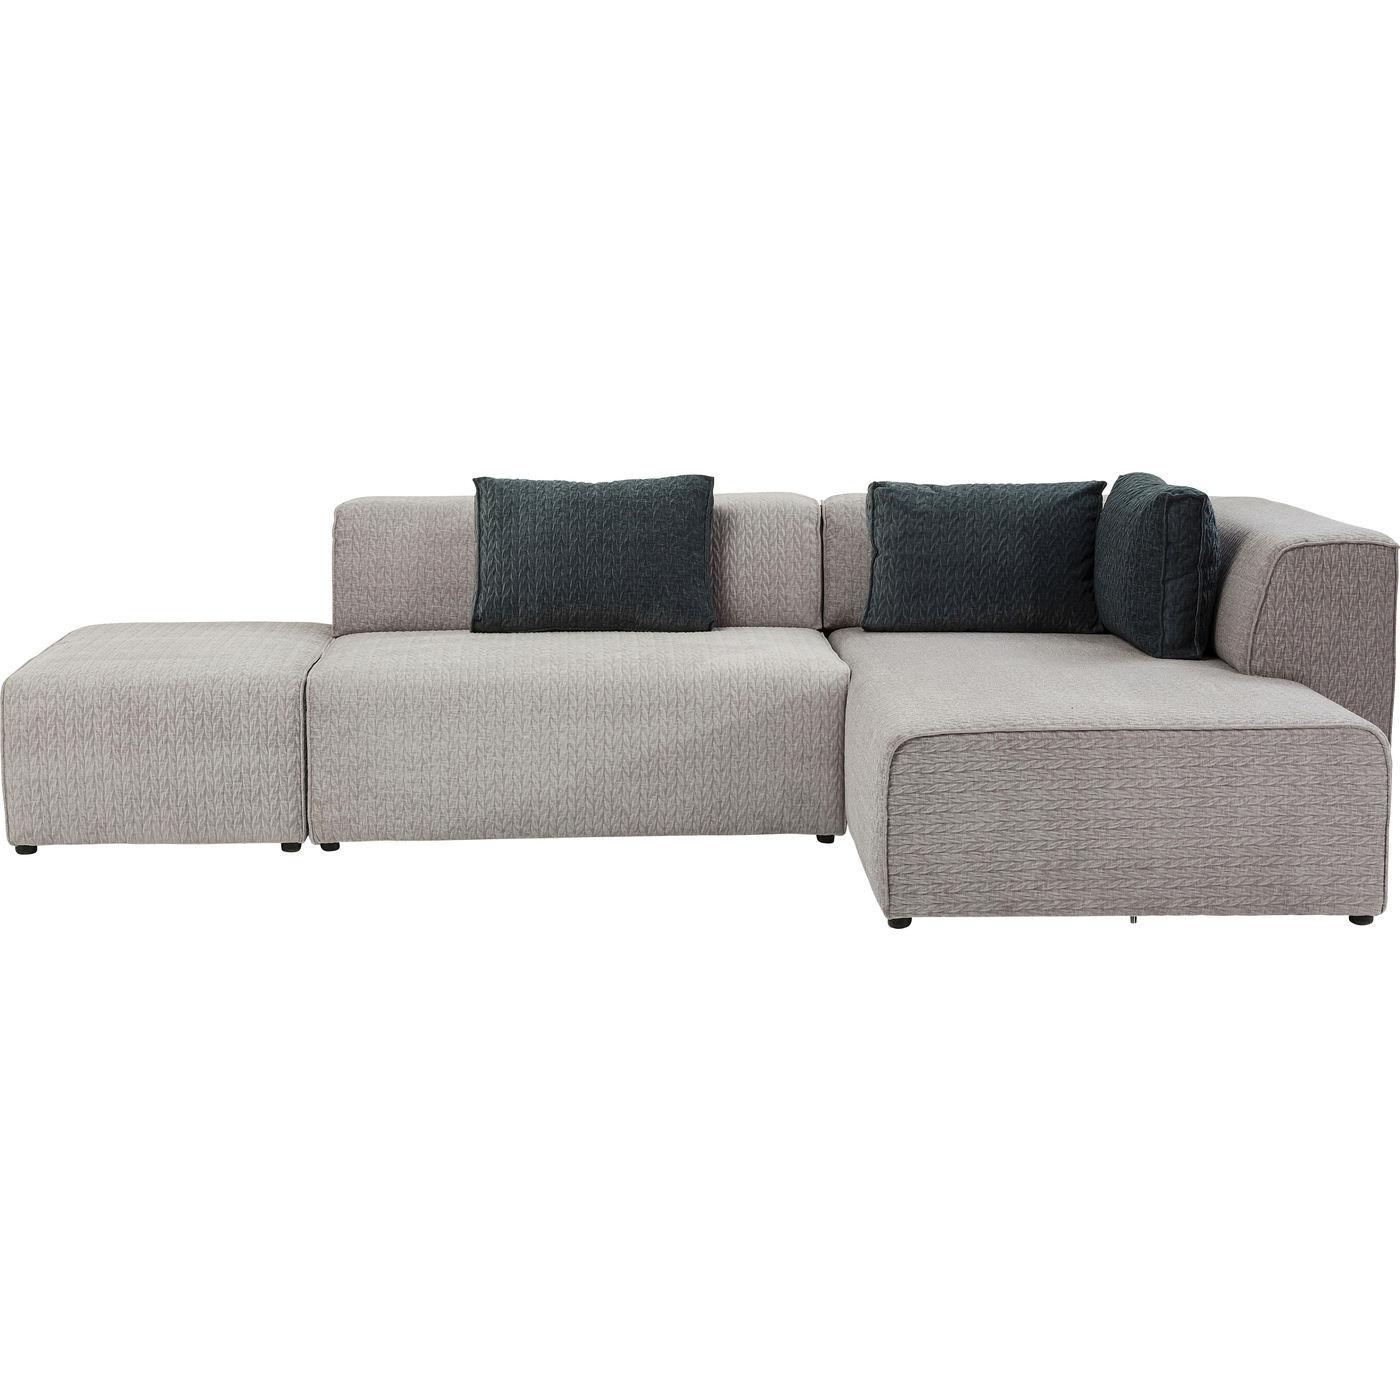 sofa infinity soft ottomane grau rechts. Black Bedroom Furniture Sets. Home Design Ideas